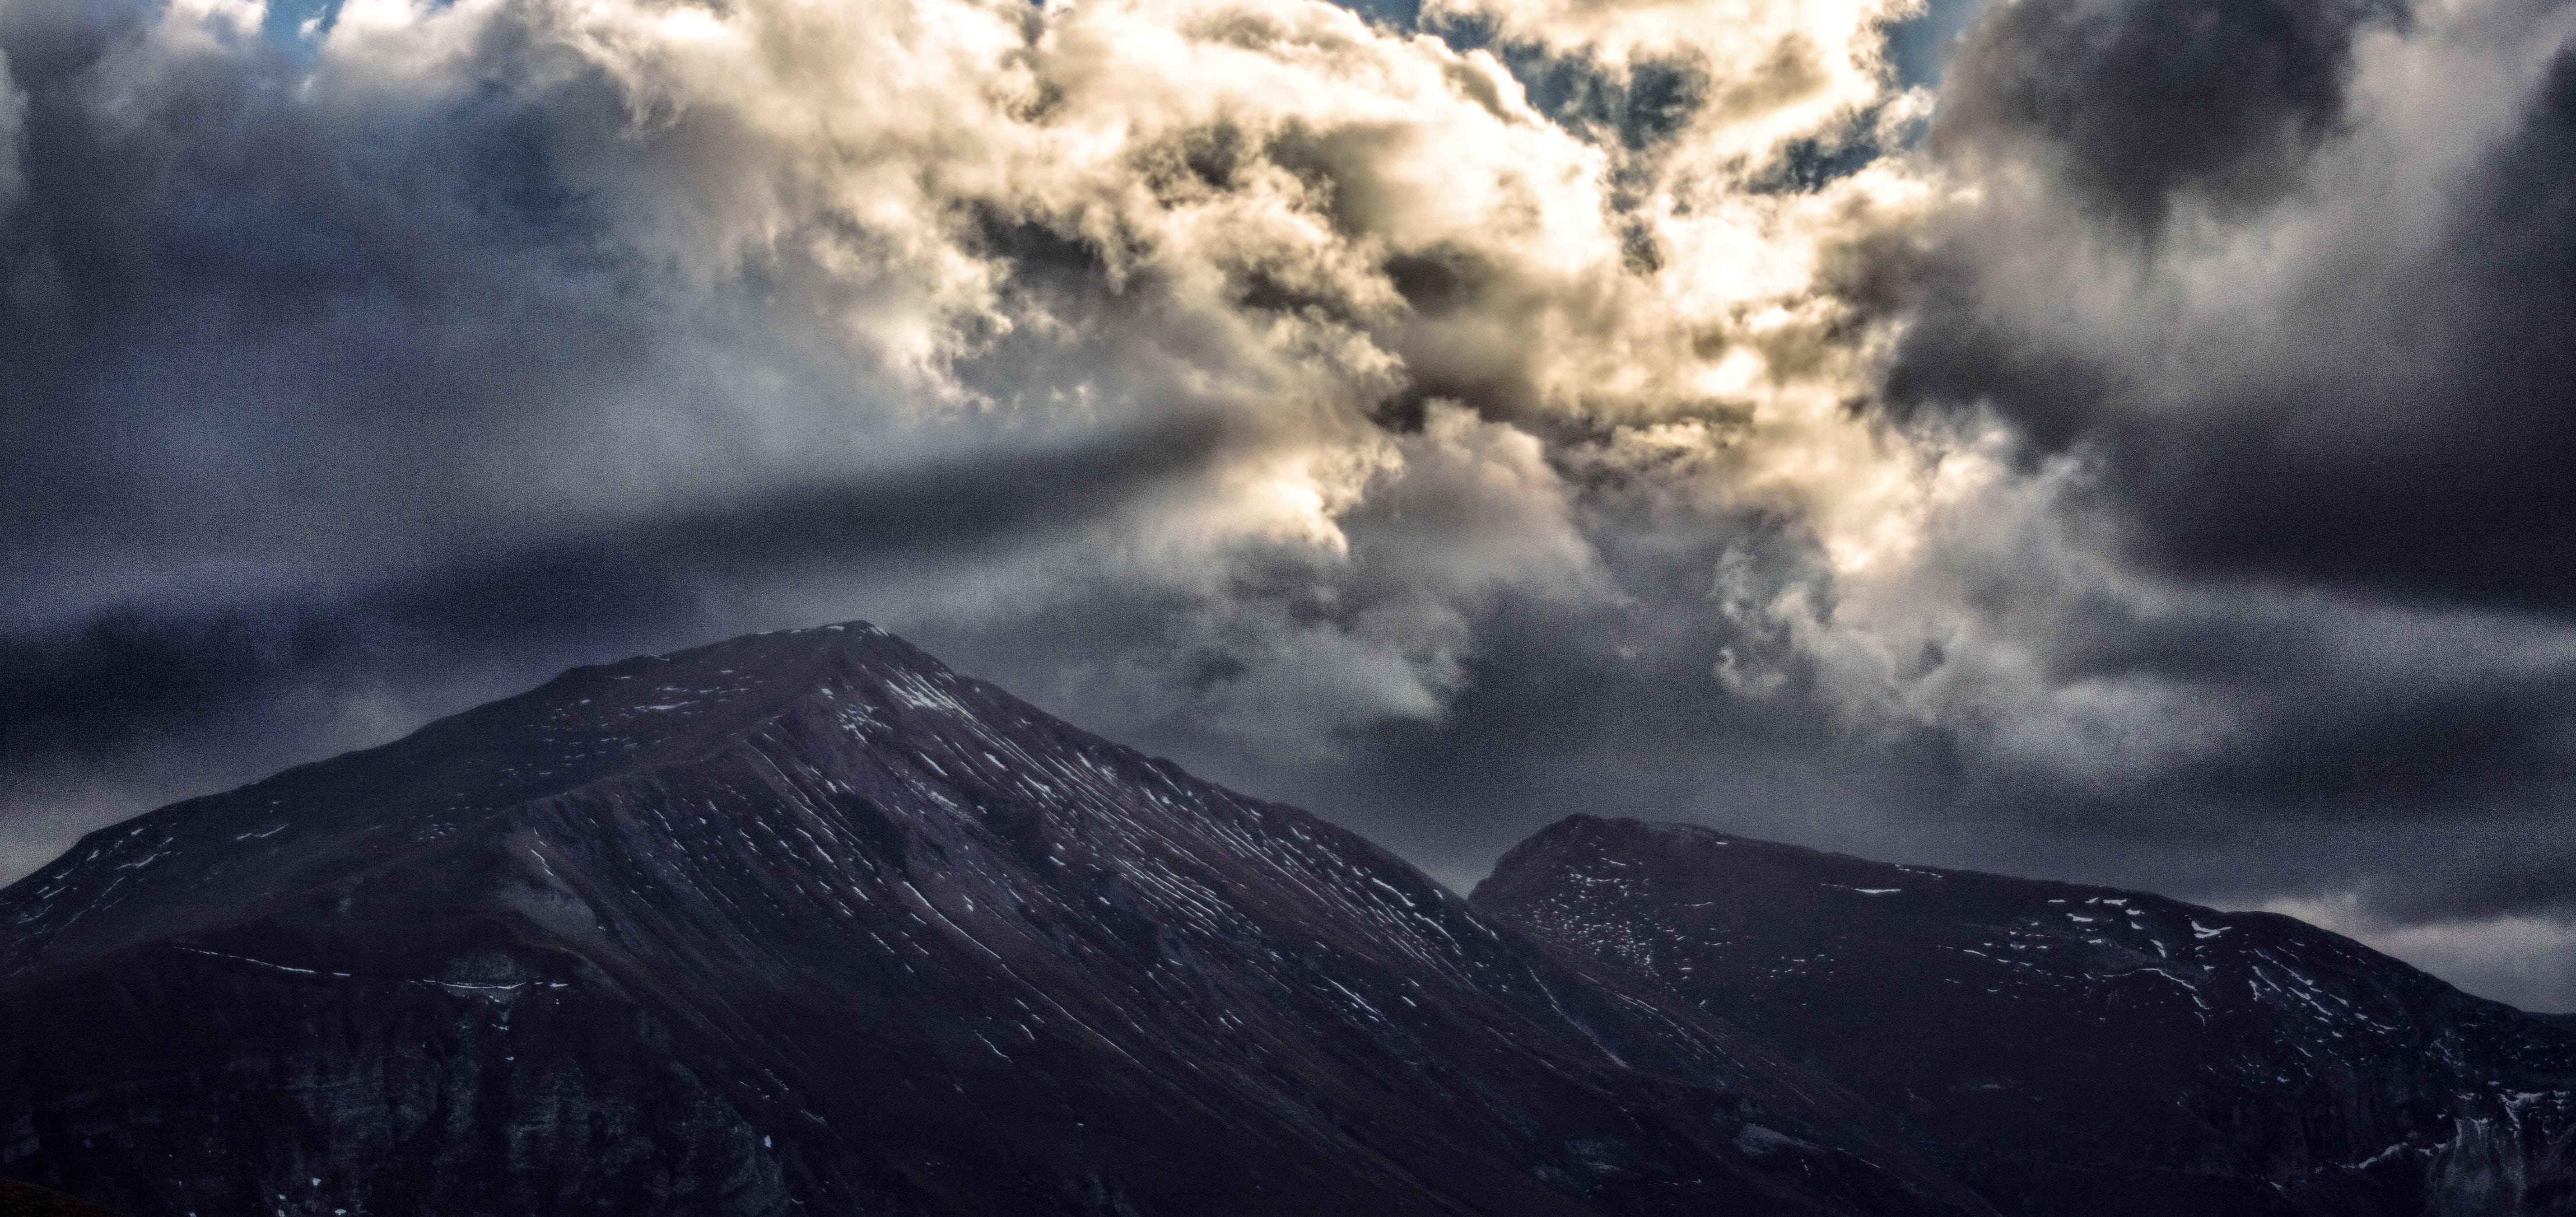 Kostnadsfri bild av 4k tapeter, berg, HD tapeter, ljus